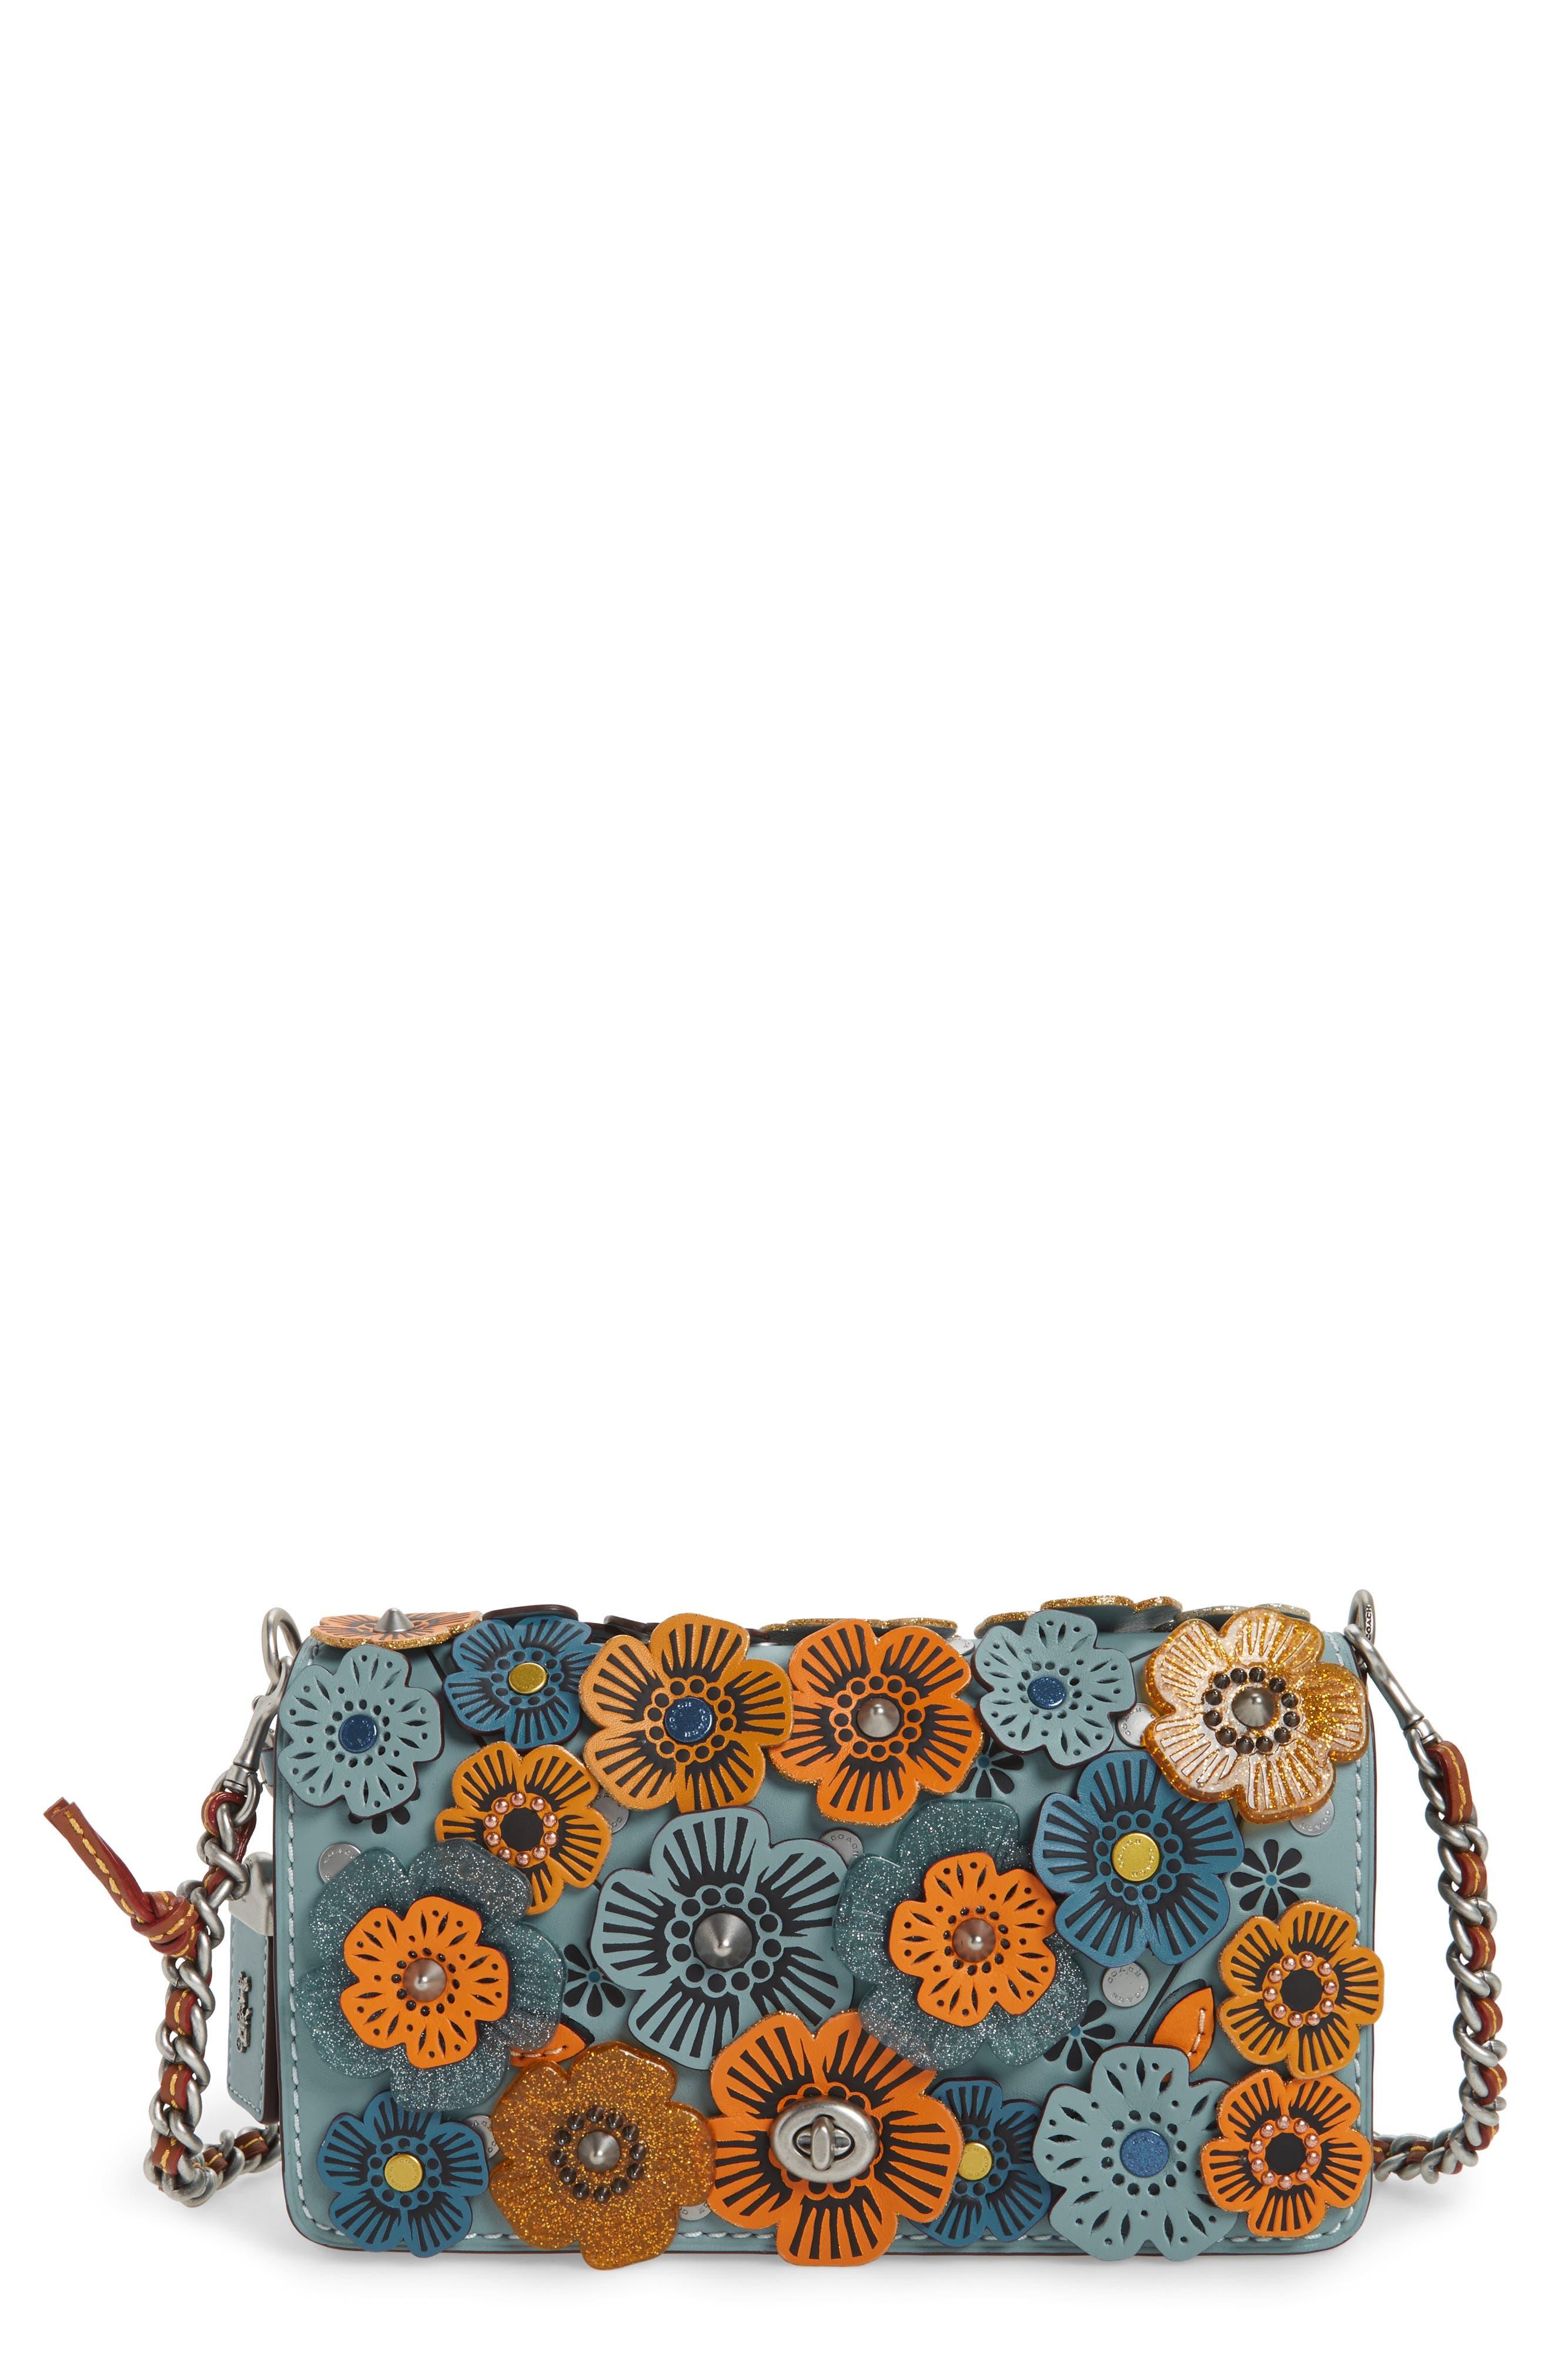 Dinky Tea Rose Appliqué Leather Crossbody Bag,                             Main thumbnail 1, color,                             462